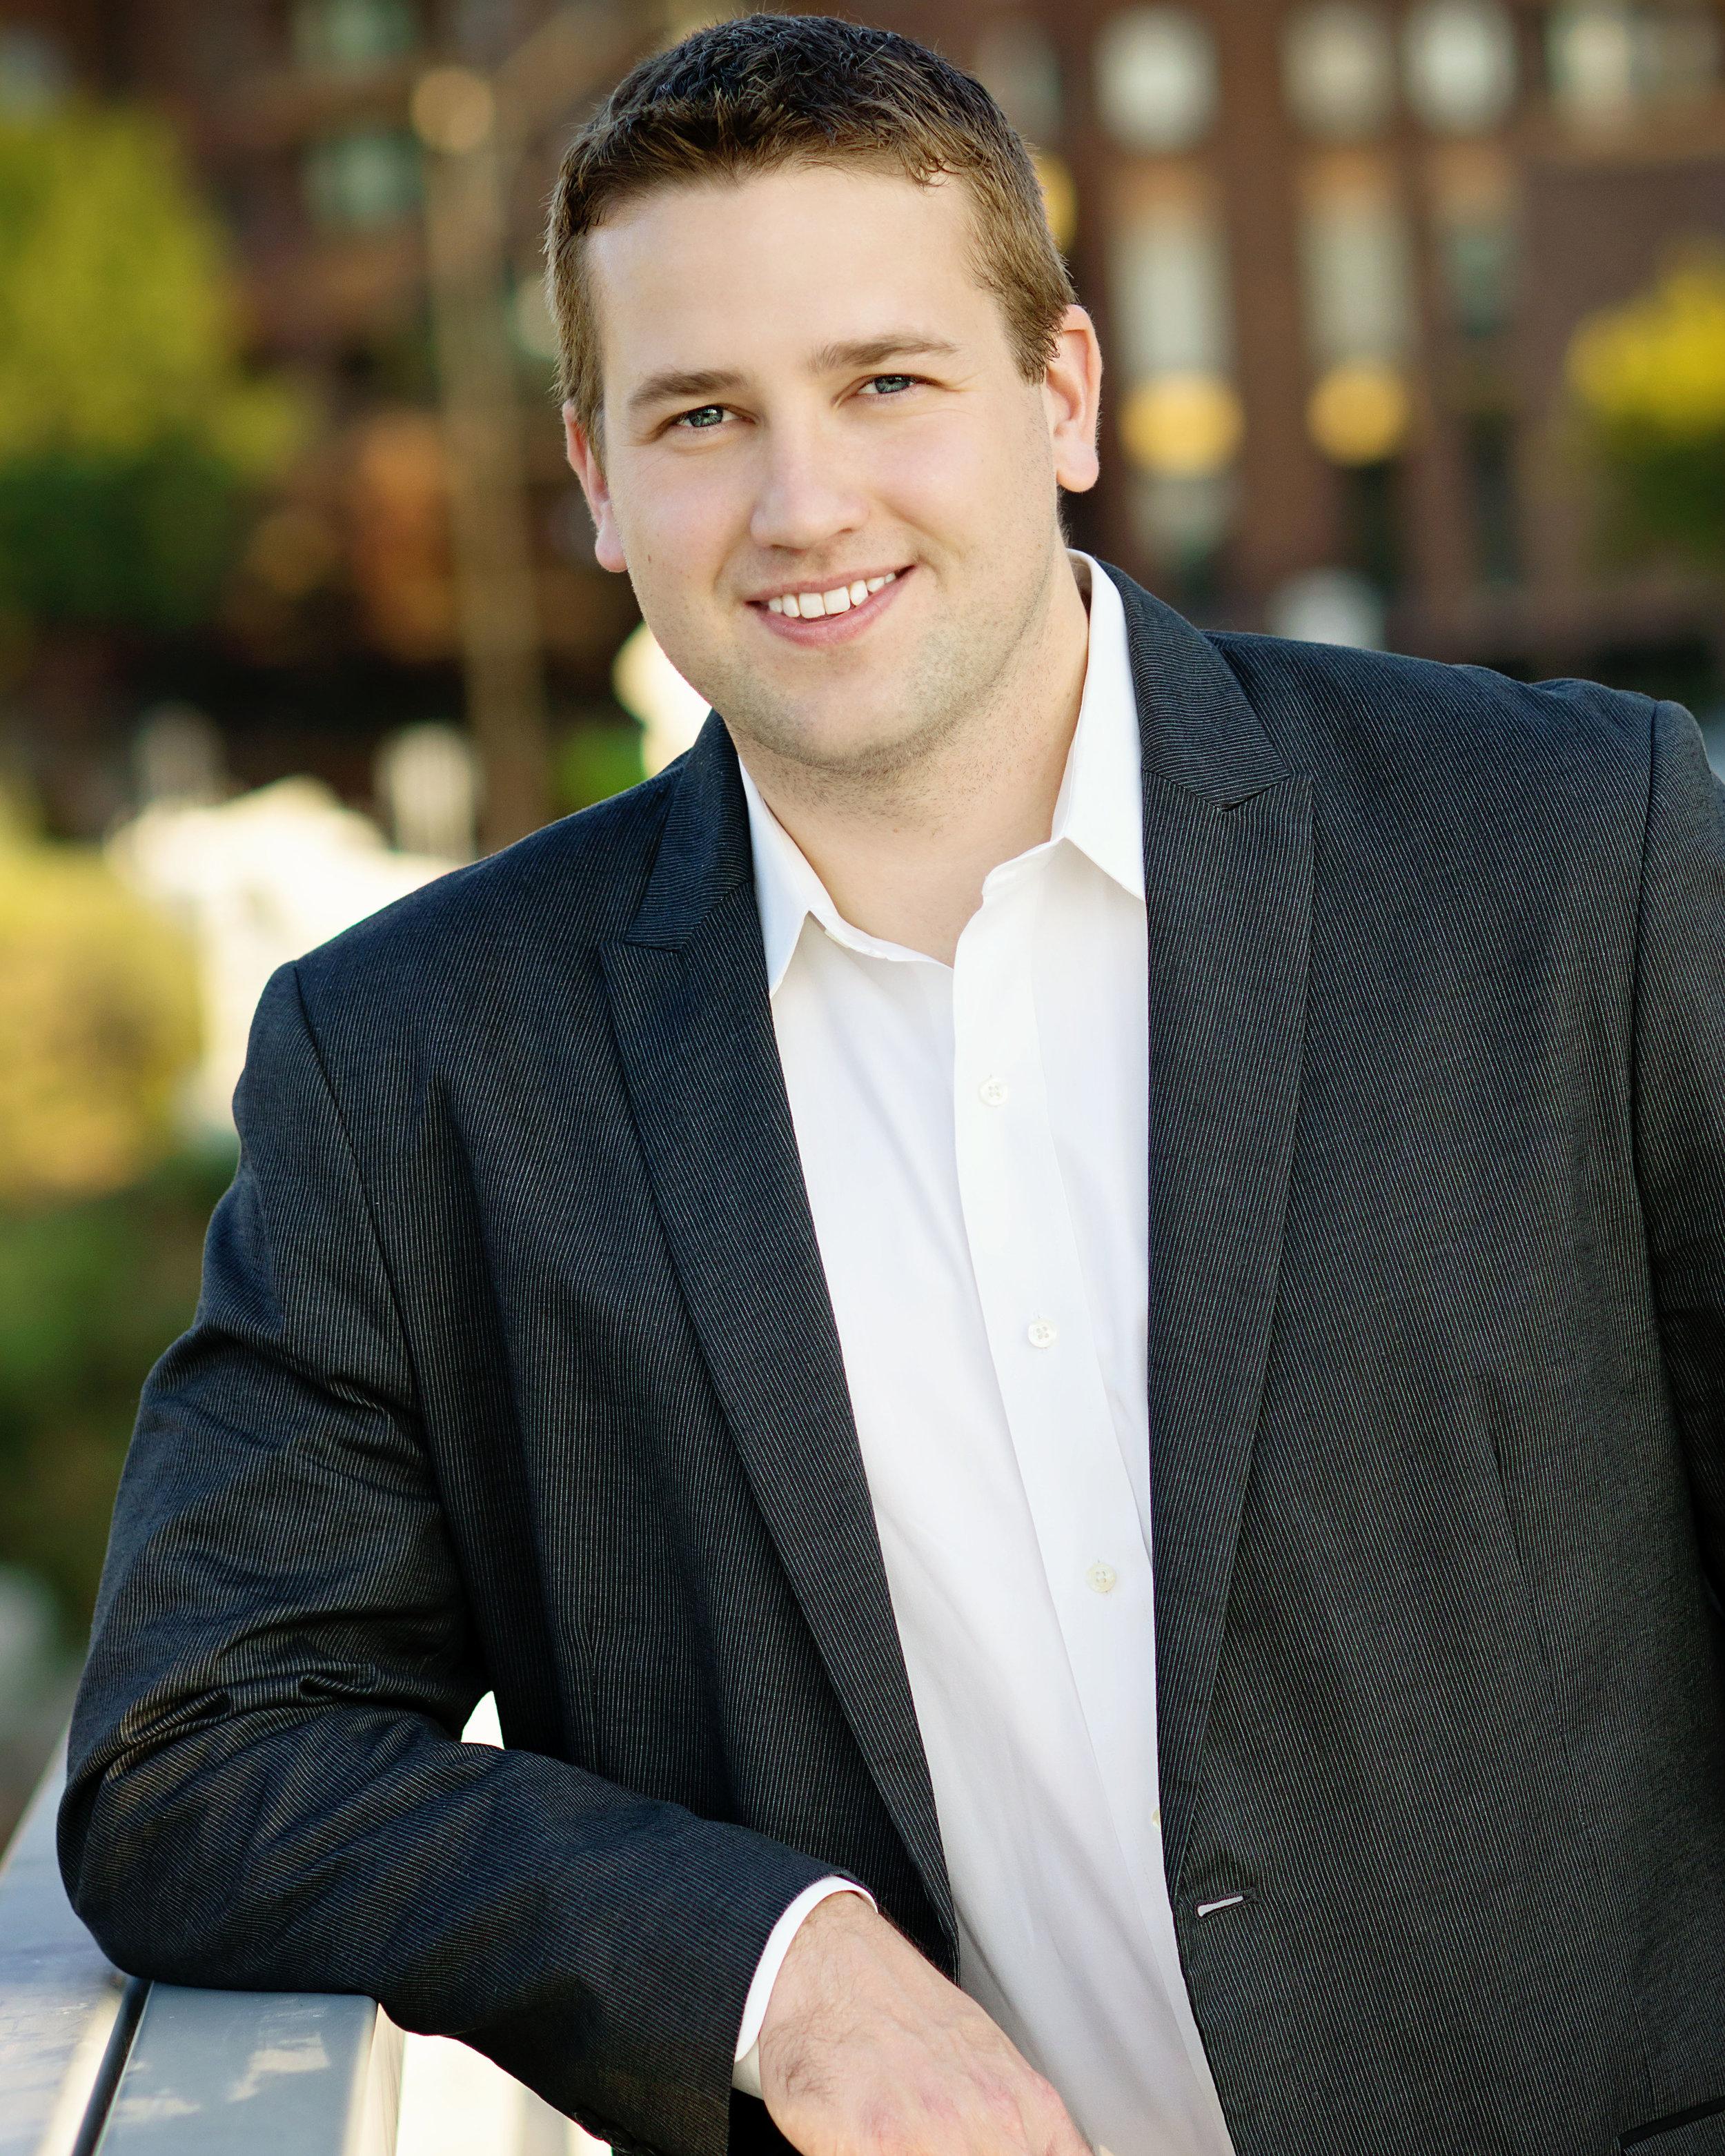 RR Portrait - Matt Cochrel.jpg